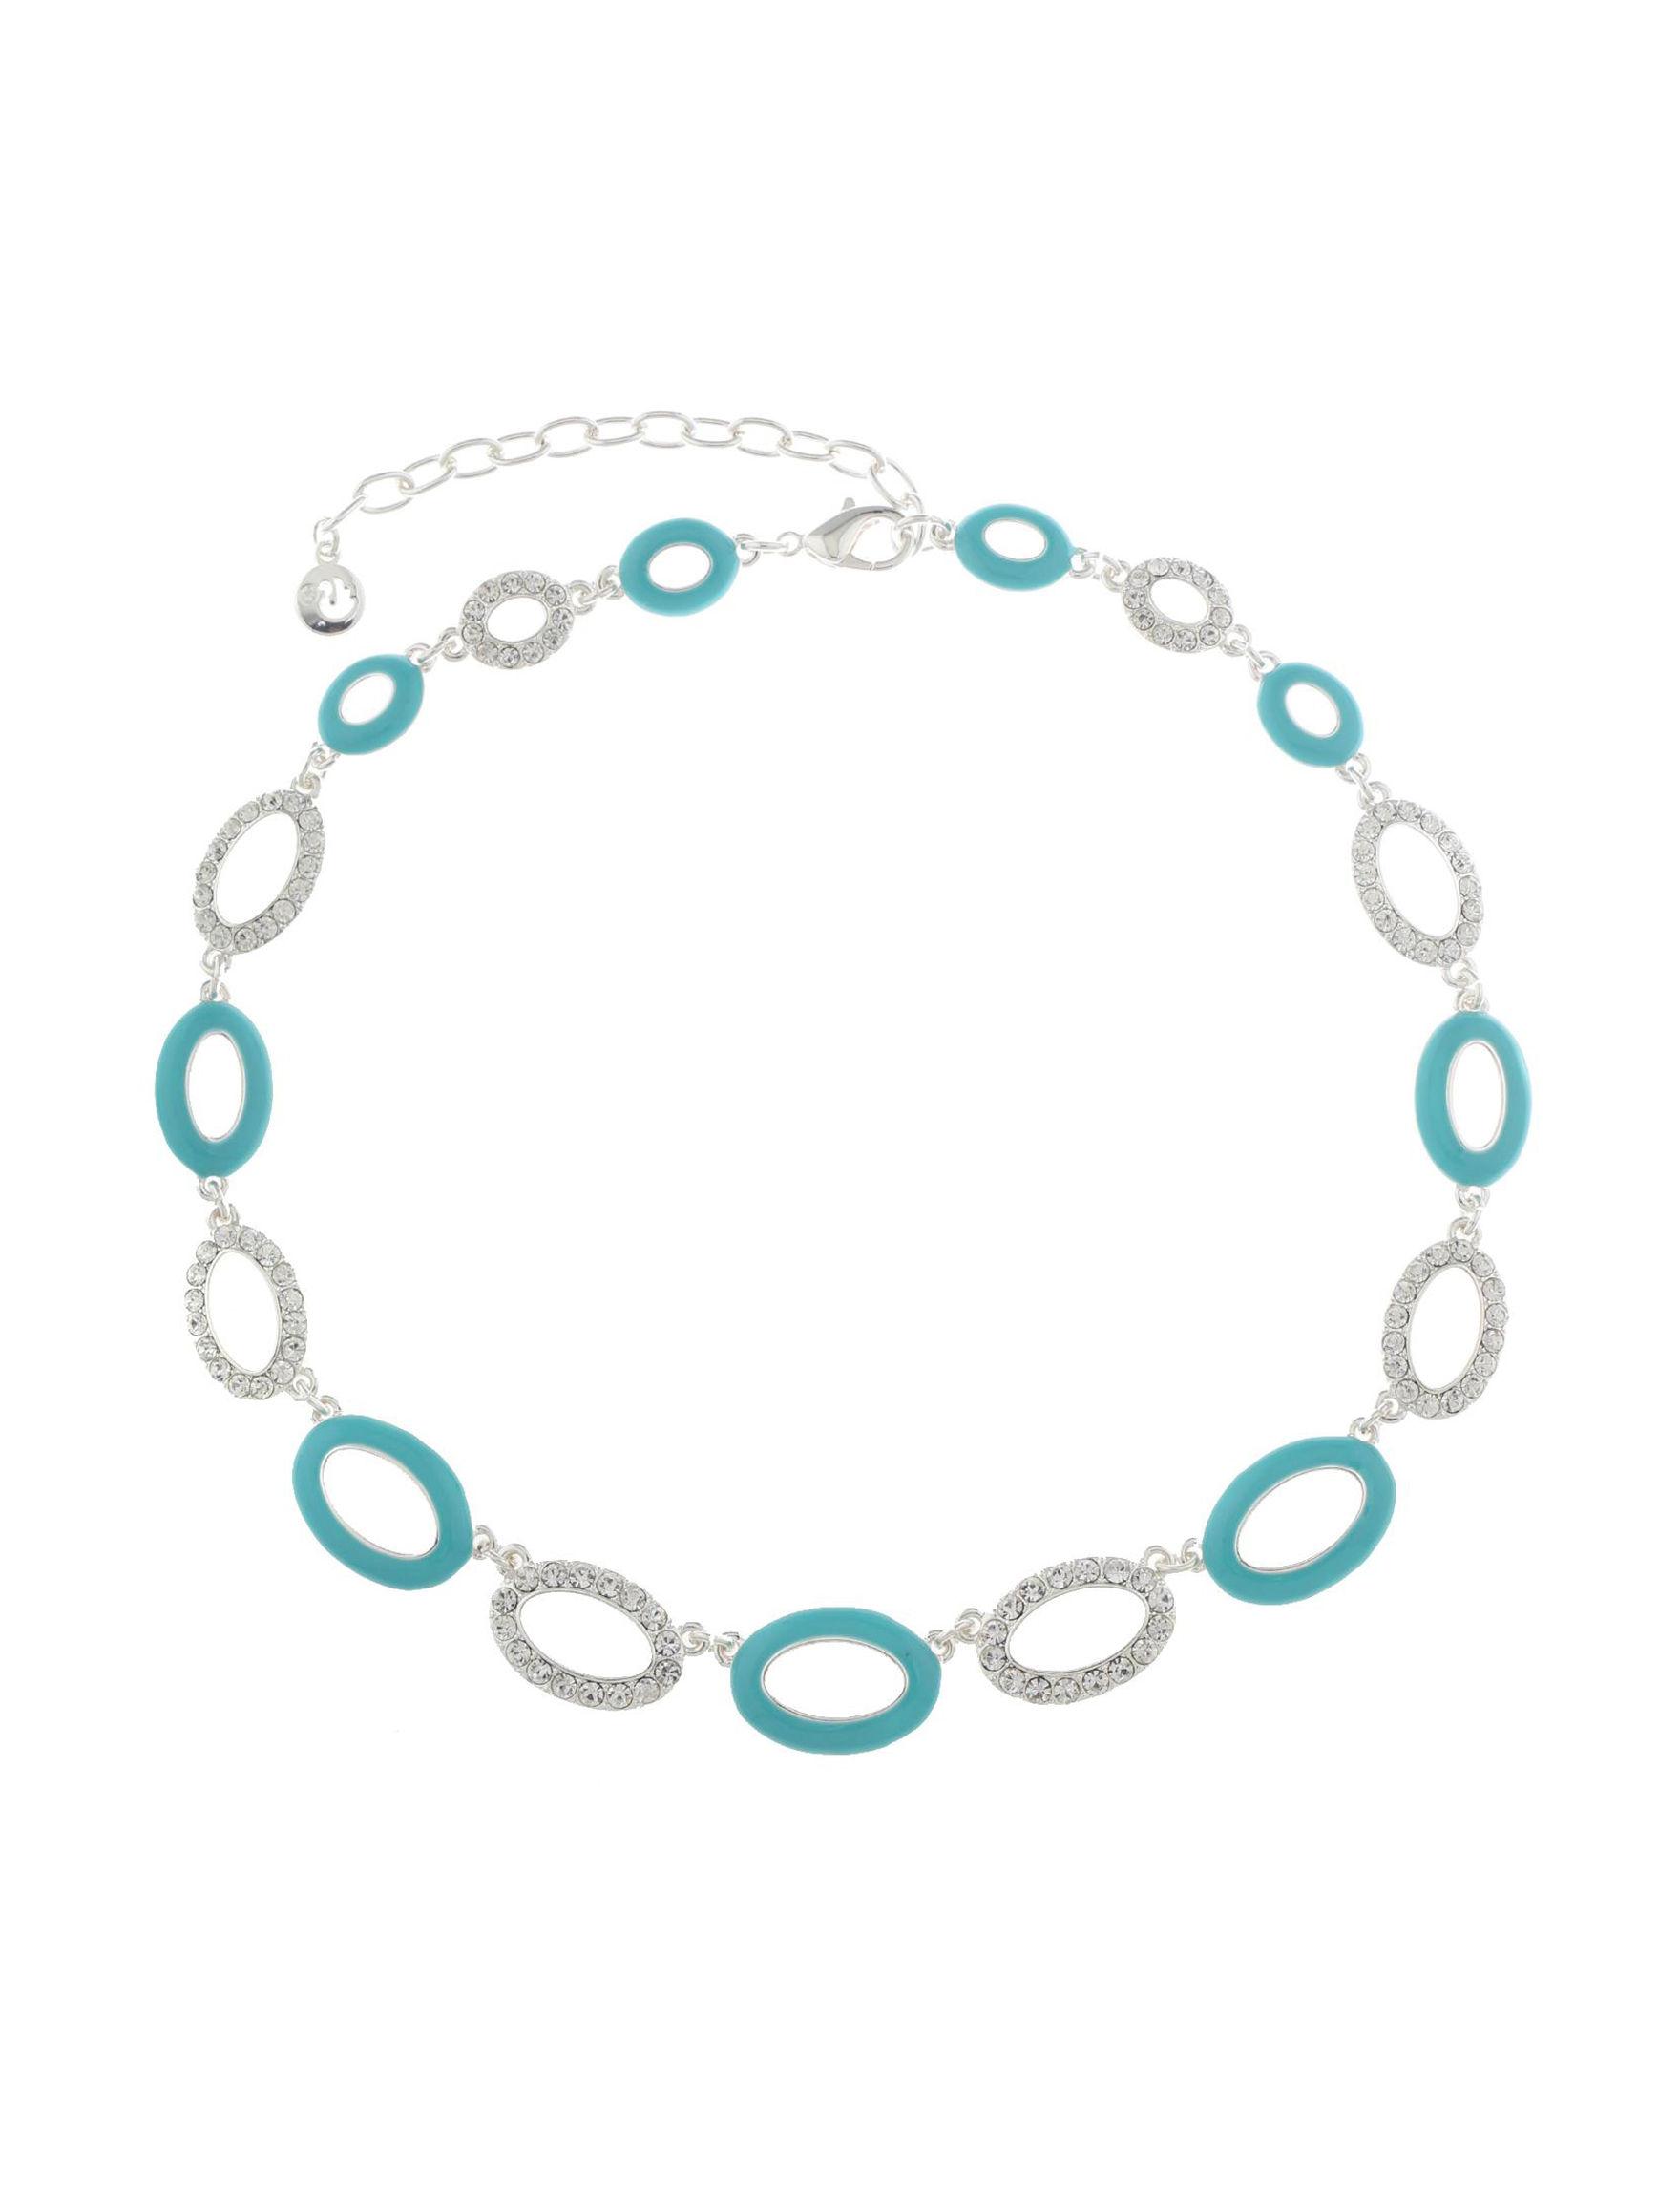 Gloria Vanderbilt Silver / Turquoise Necklaces & Pendants Fashion Jewelry